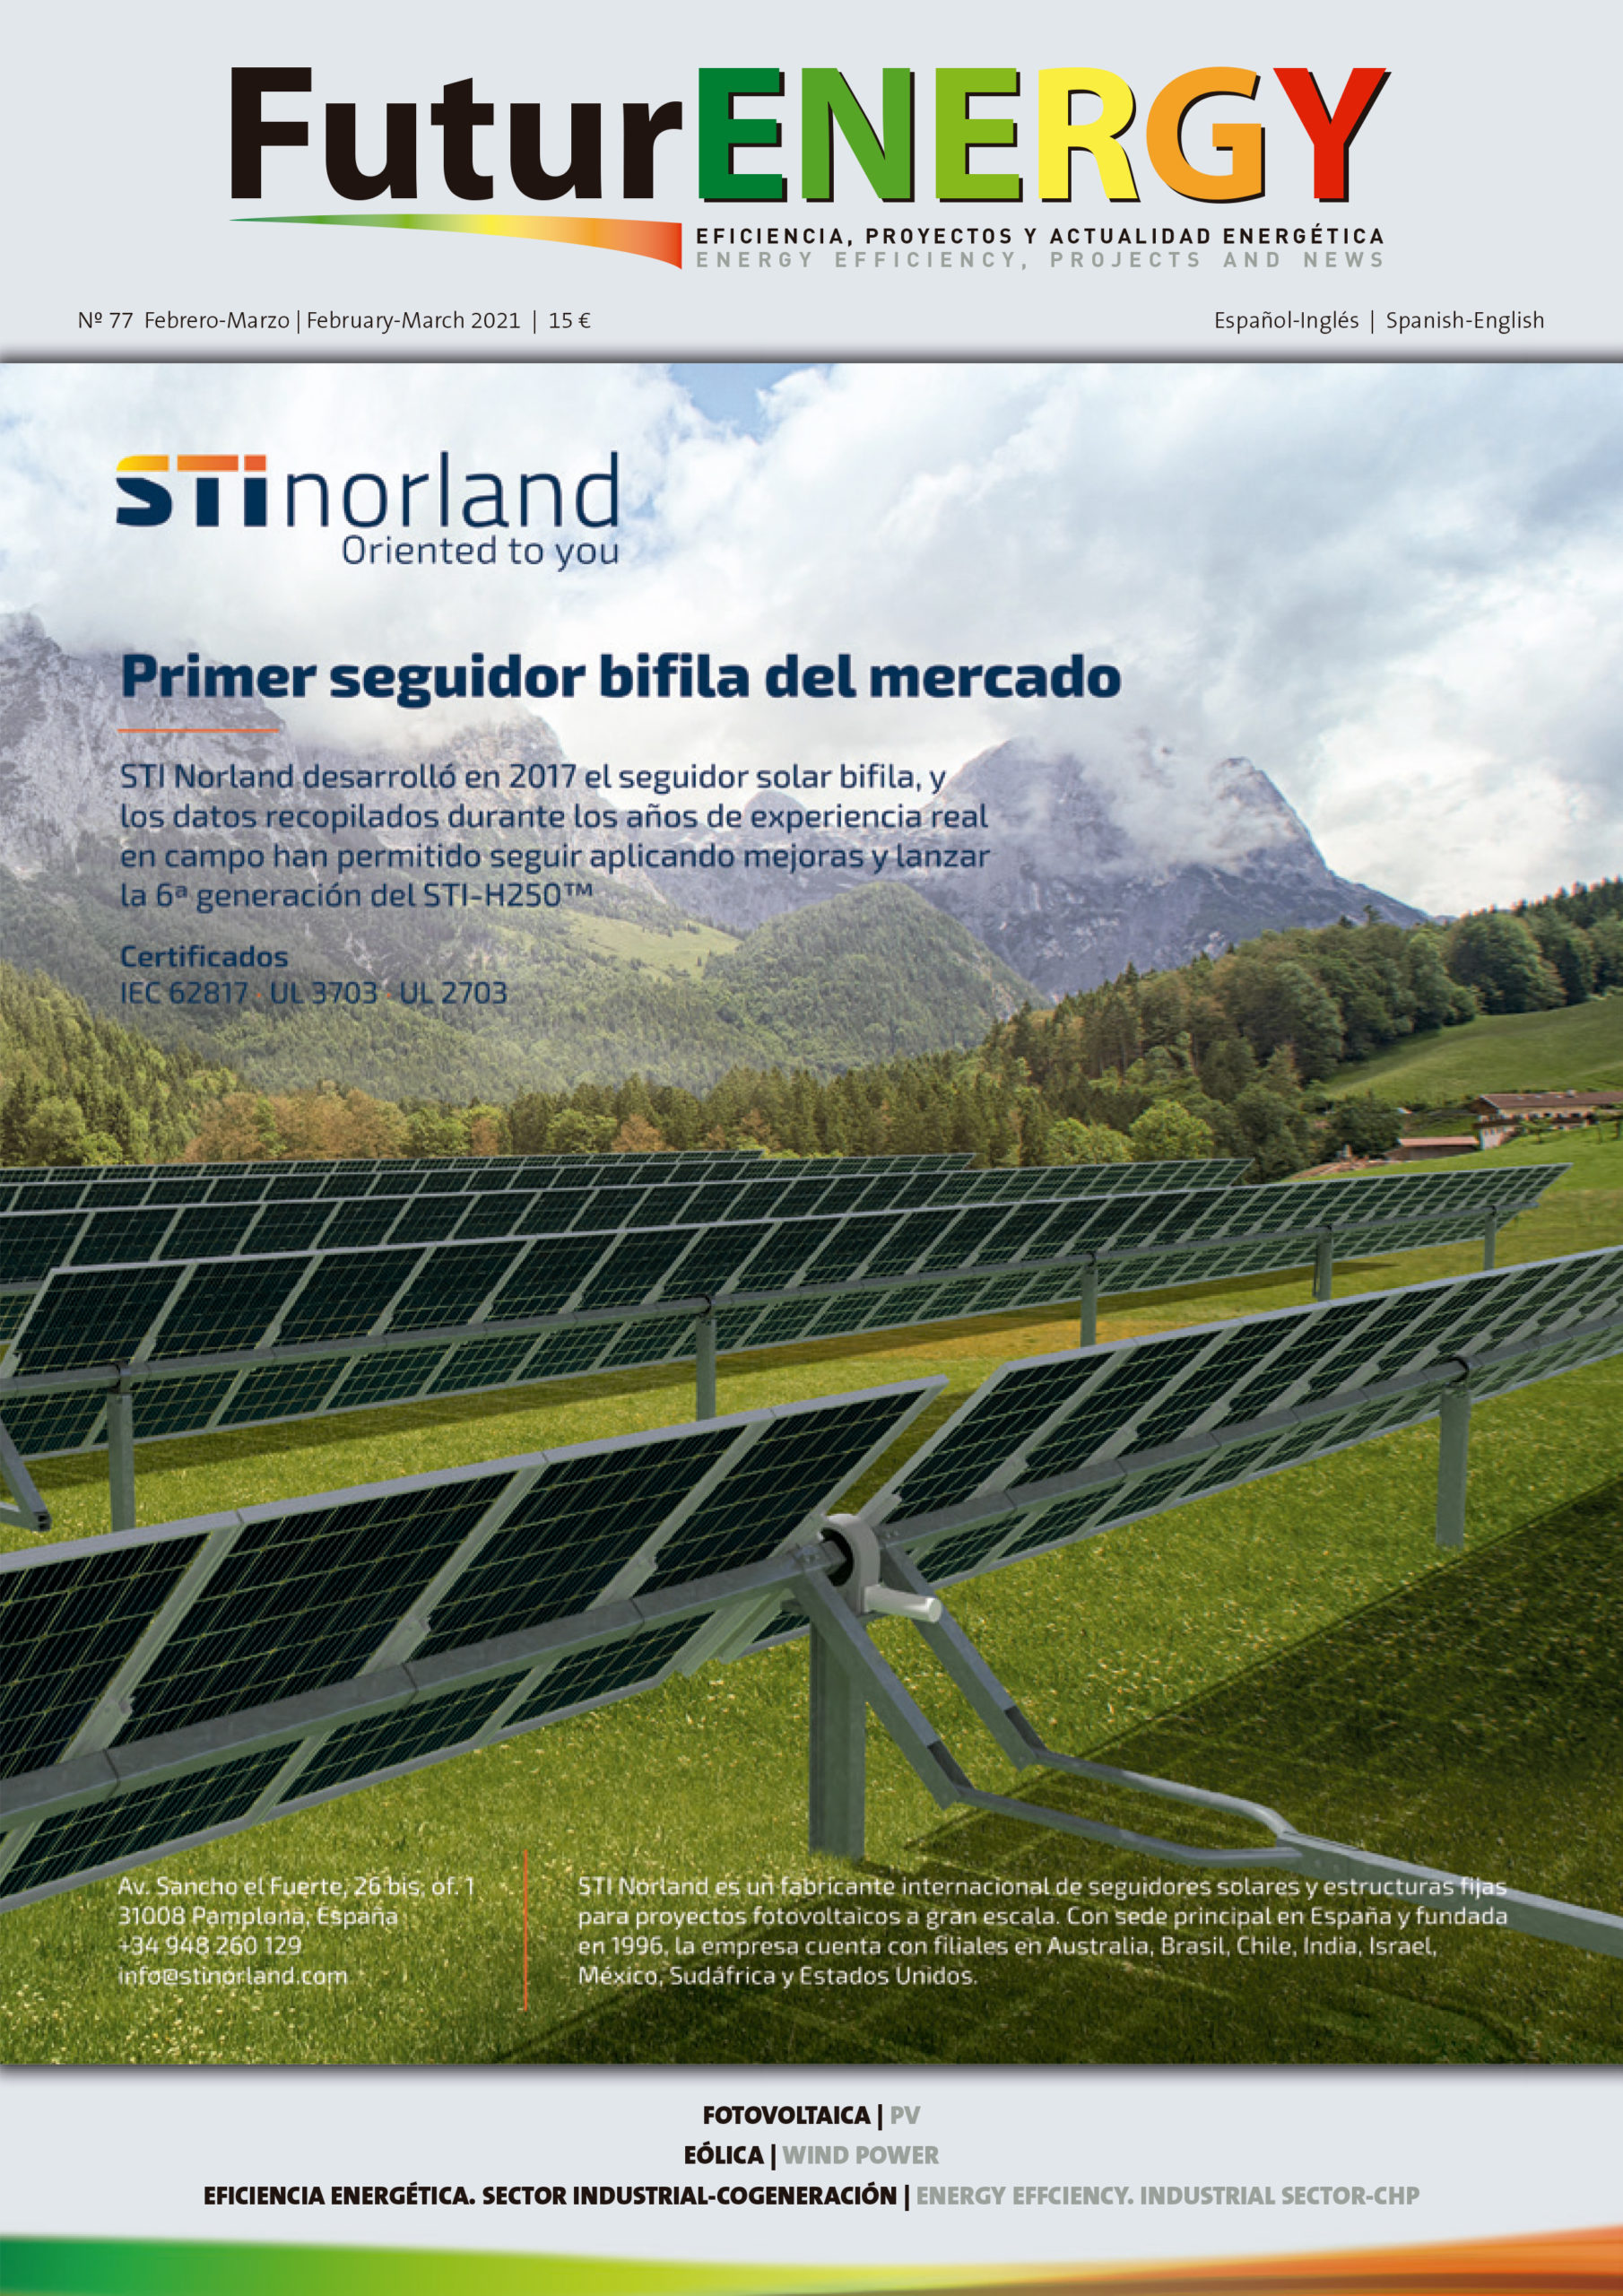 FuturENERGY proyectos agrivoltaicos TRANESOL01